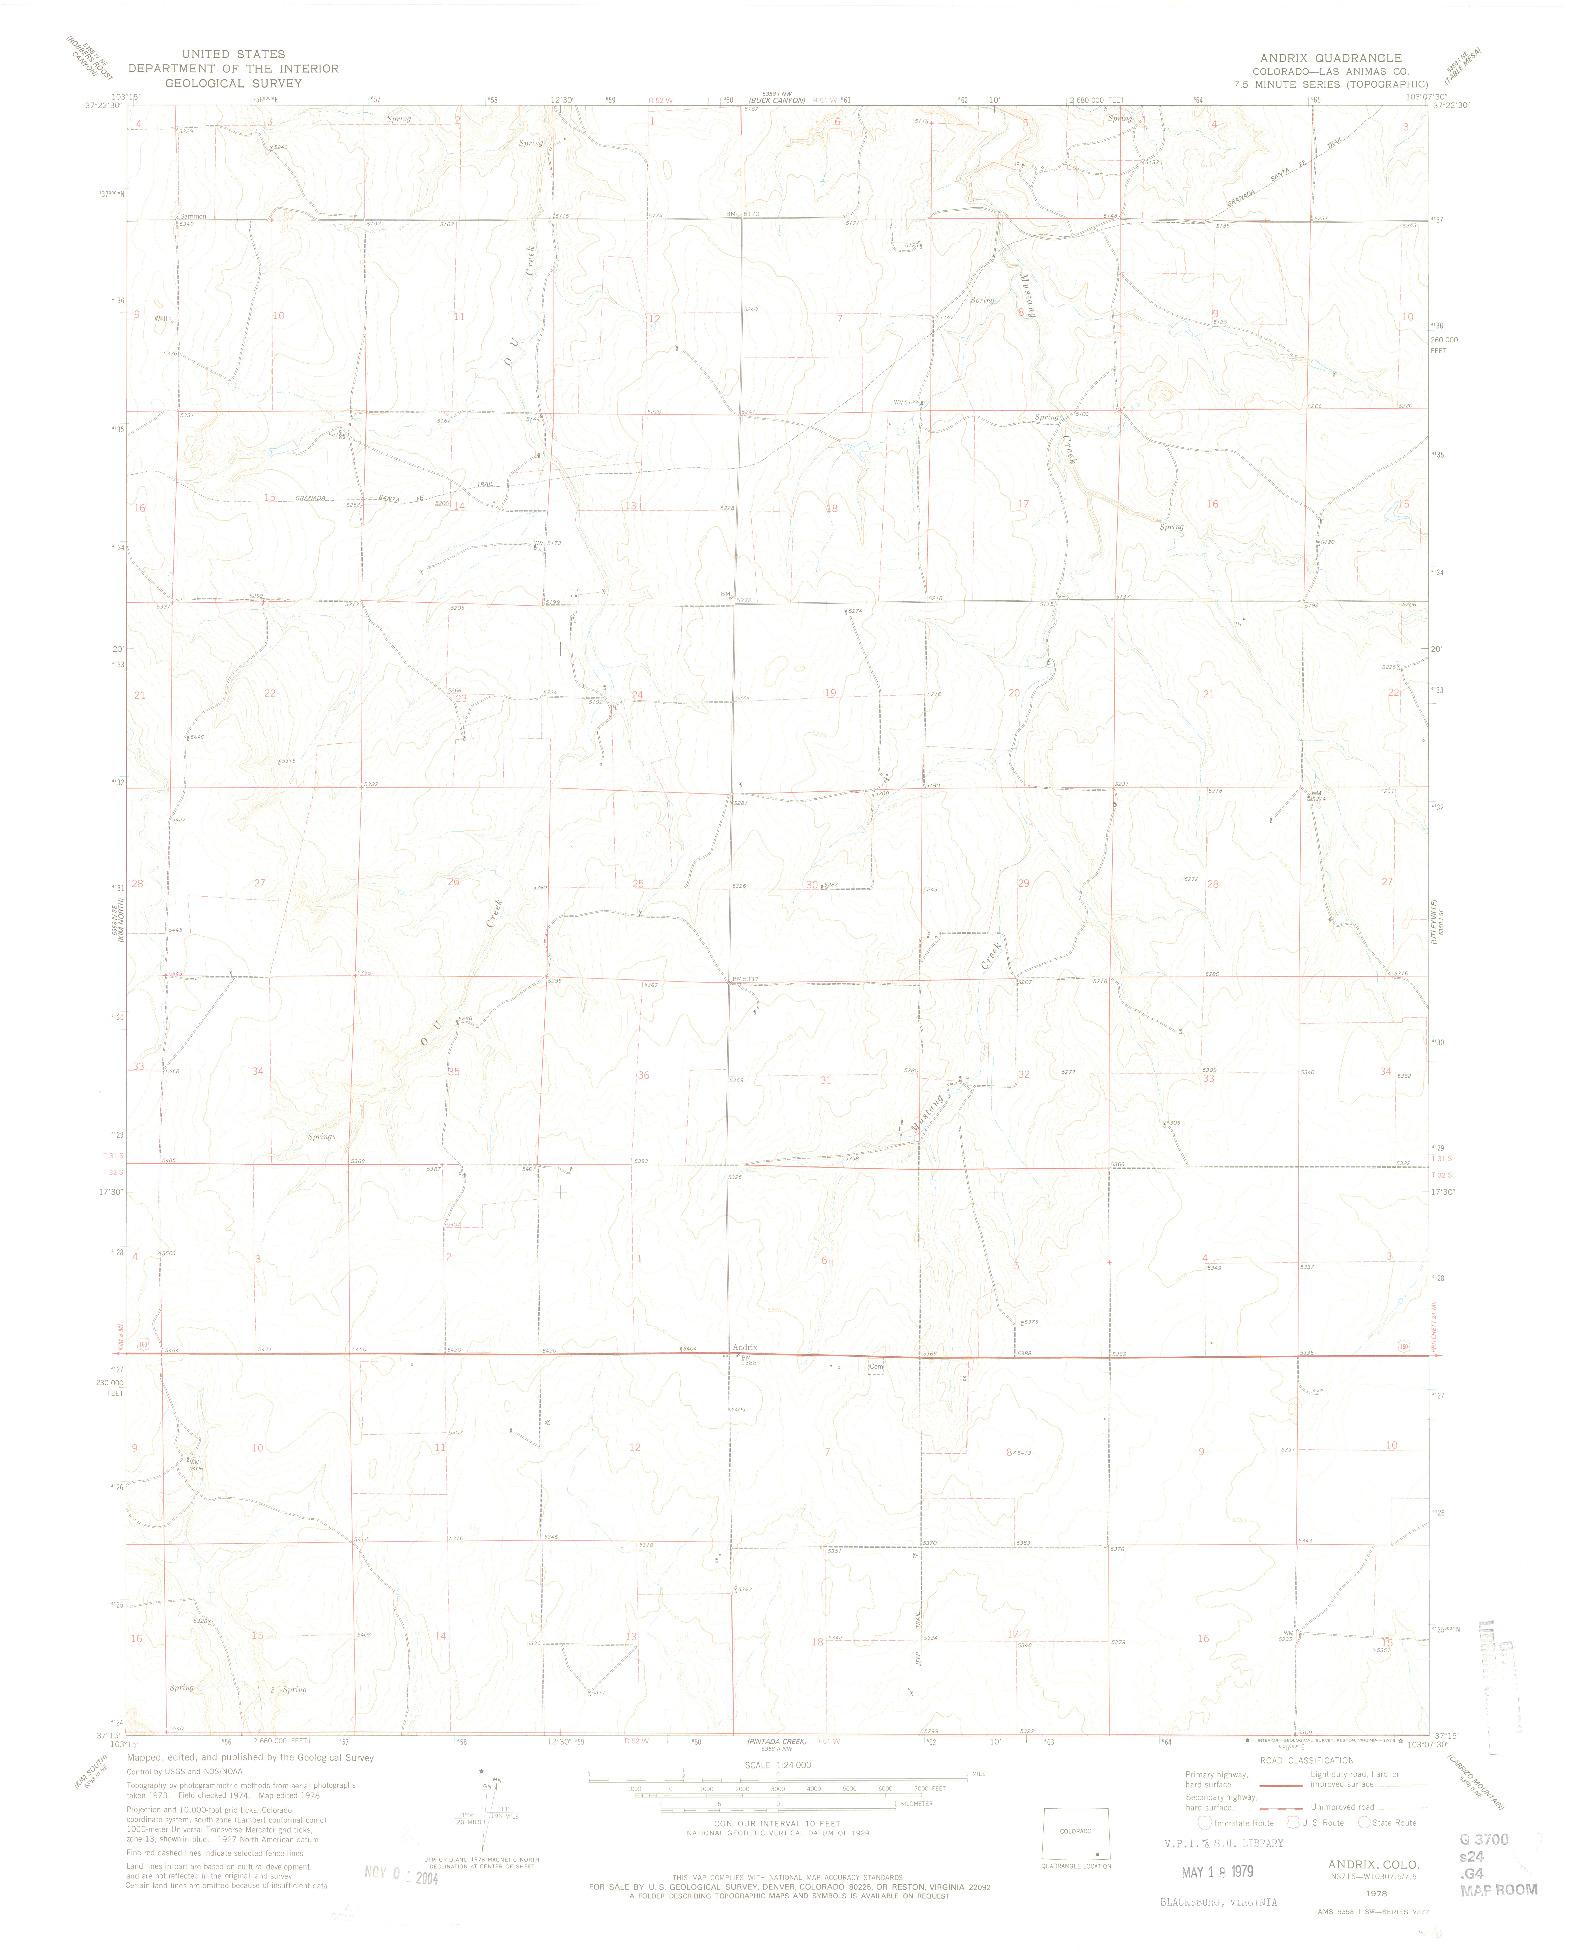 USGS 1:24000-SCALE QUADRANGLE FOR ANDRIX, CO 1978